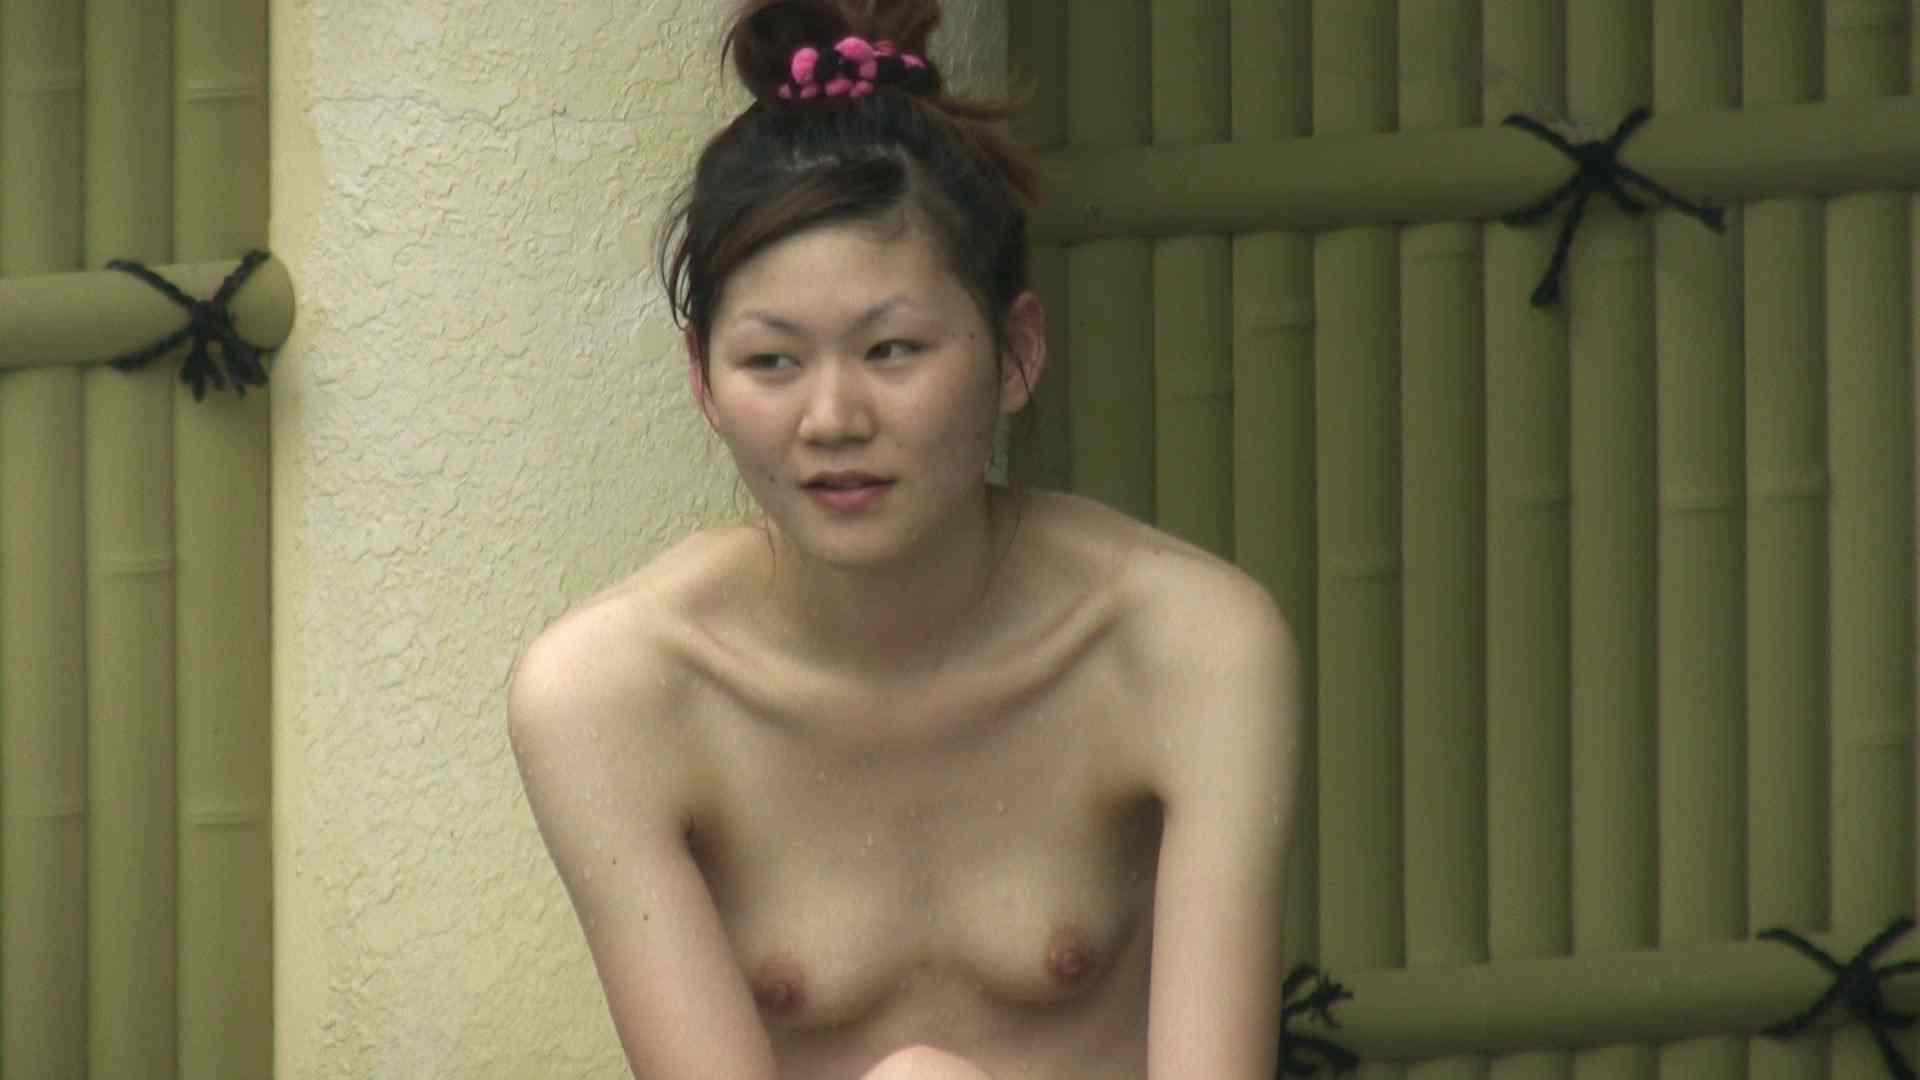 Aquaな露天風呂Vol.17【VIP】 盗撮シリーズ | 露天風呂編  98PIX 65